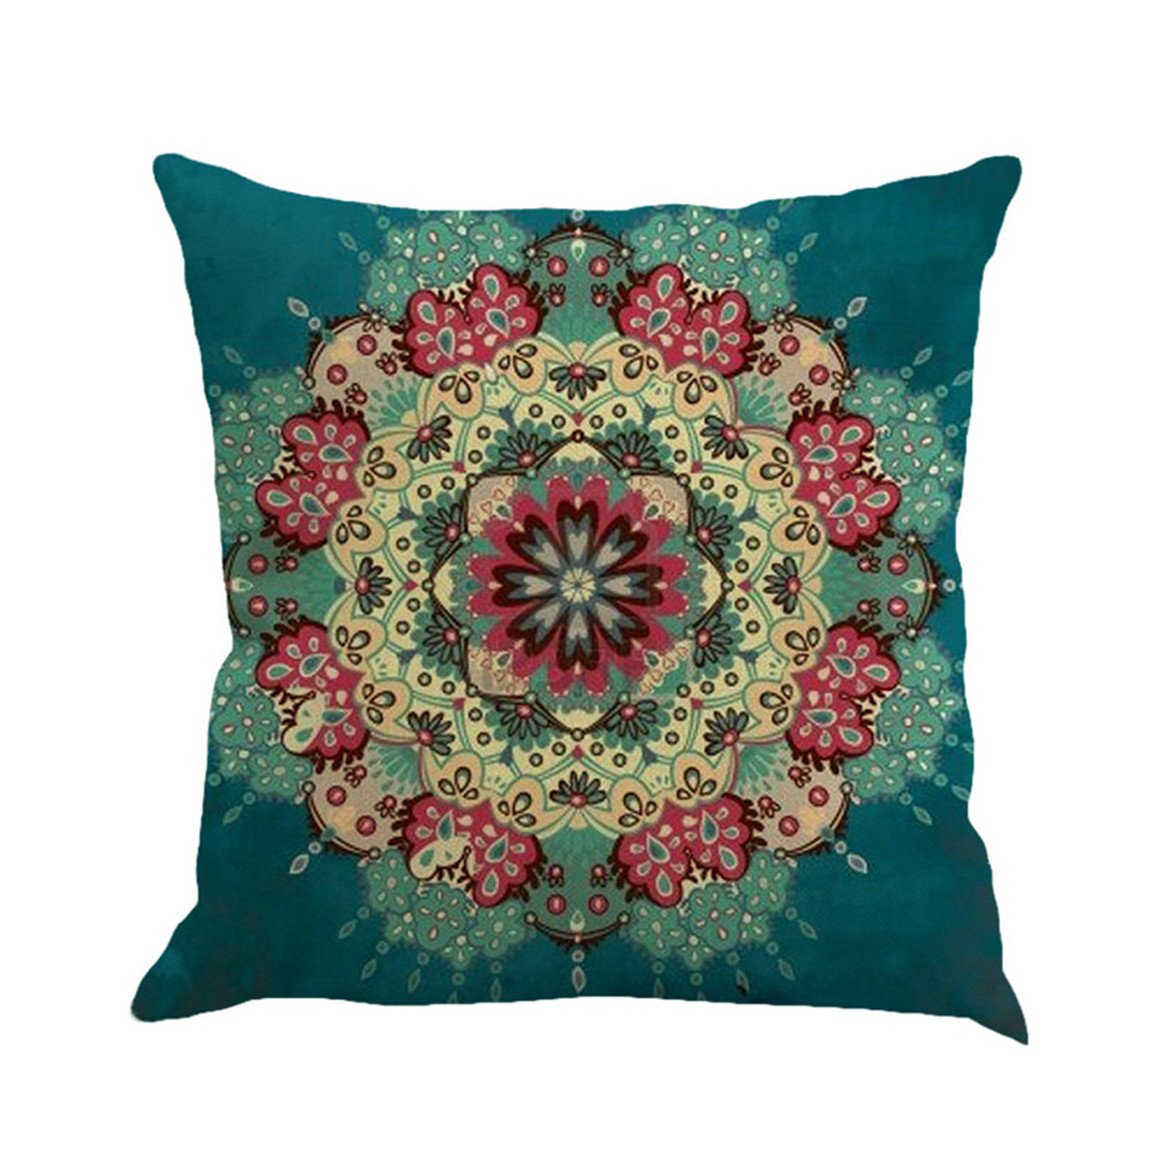 Geometry Painting Pillow Case, WENSY Fashion Square Pillow case 45cm45cm (E)